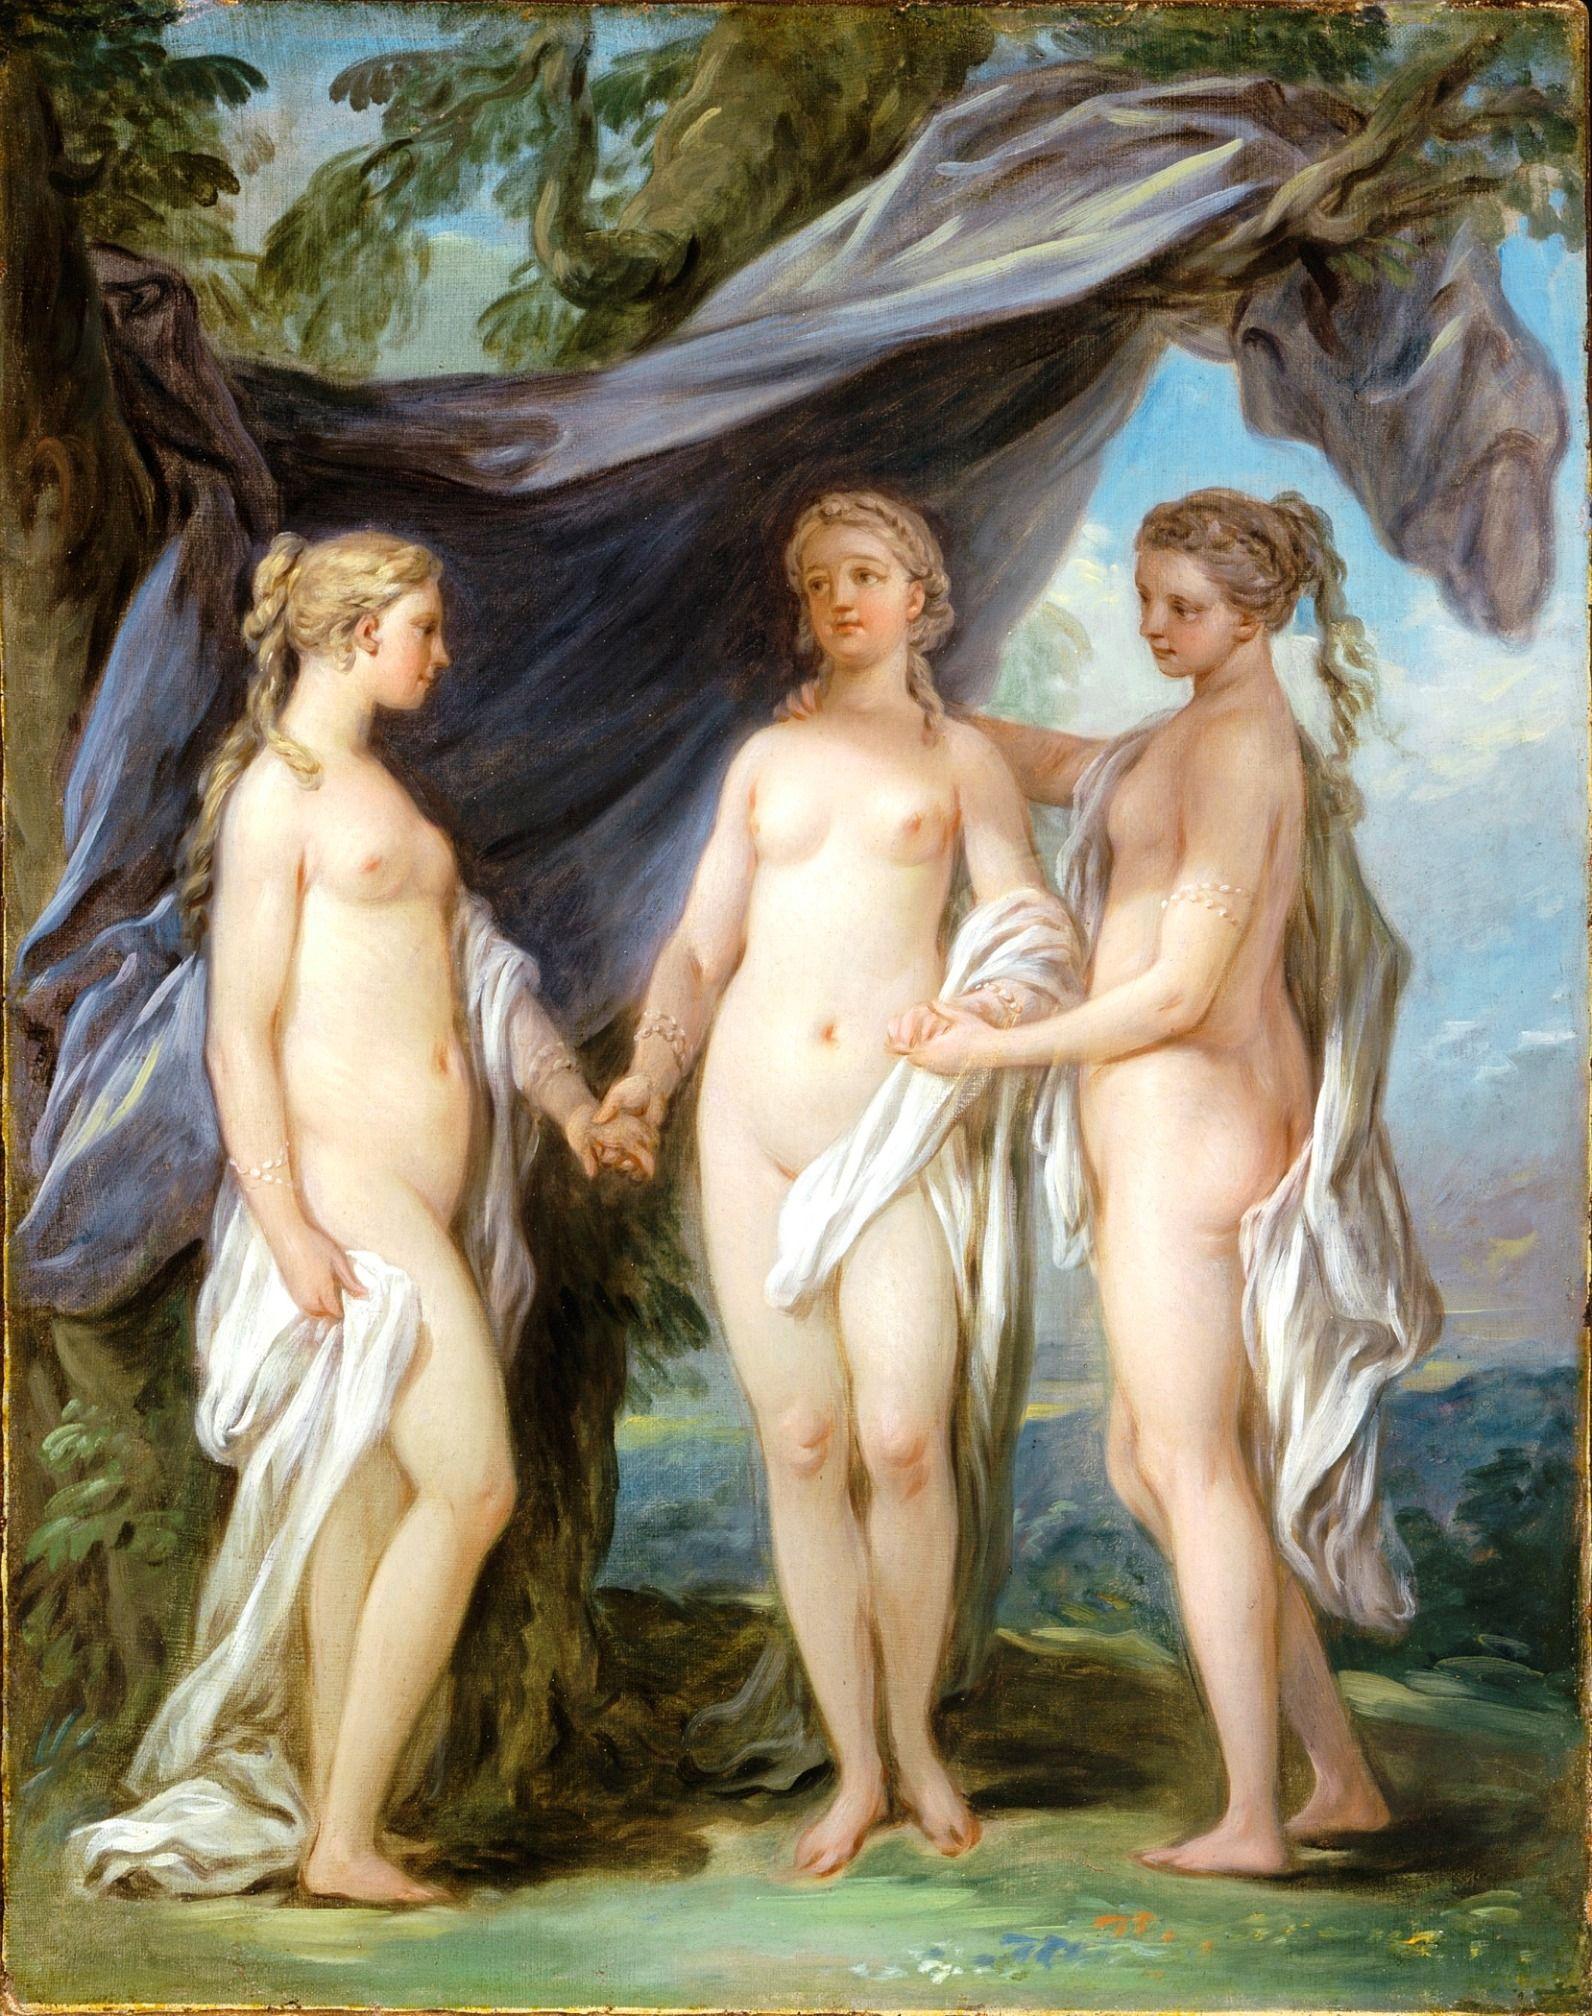 голые богини фото